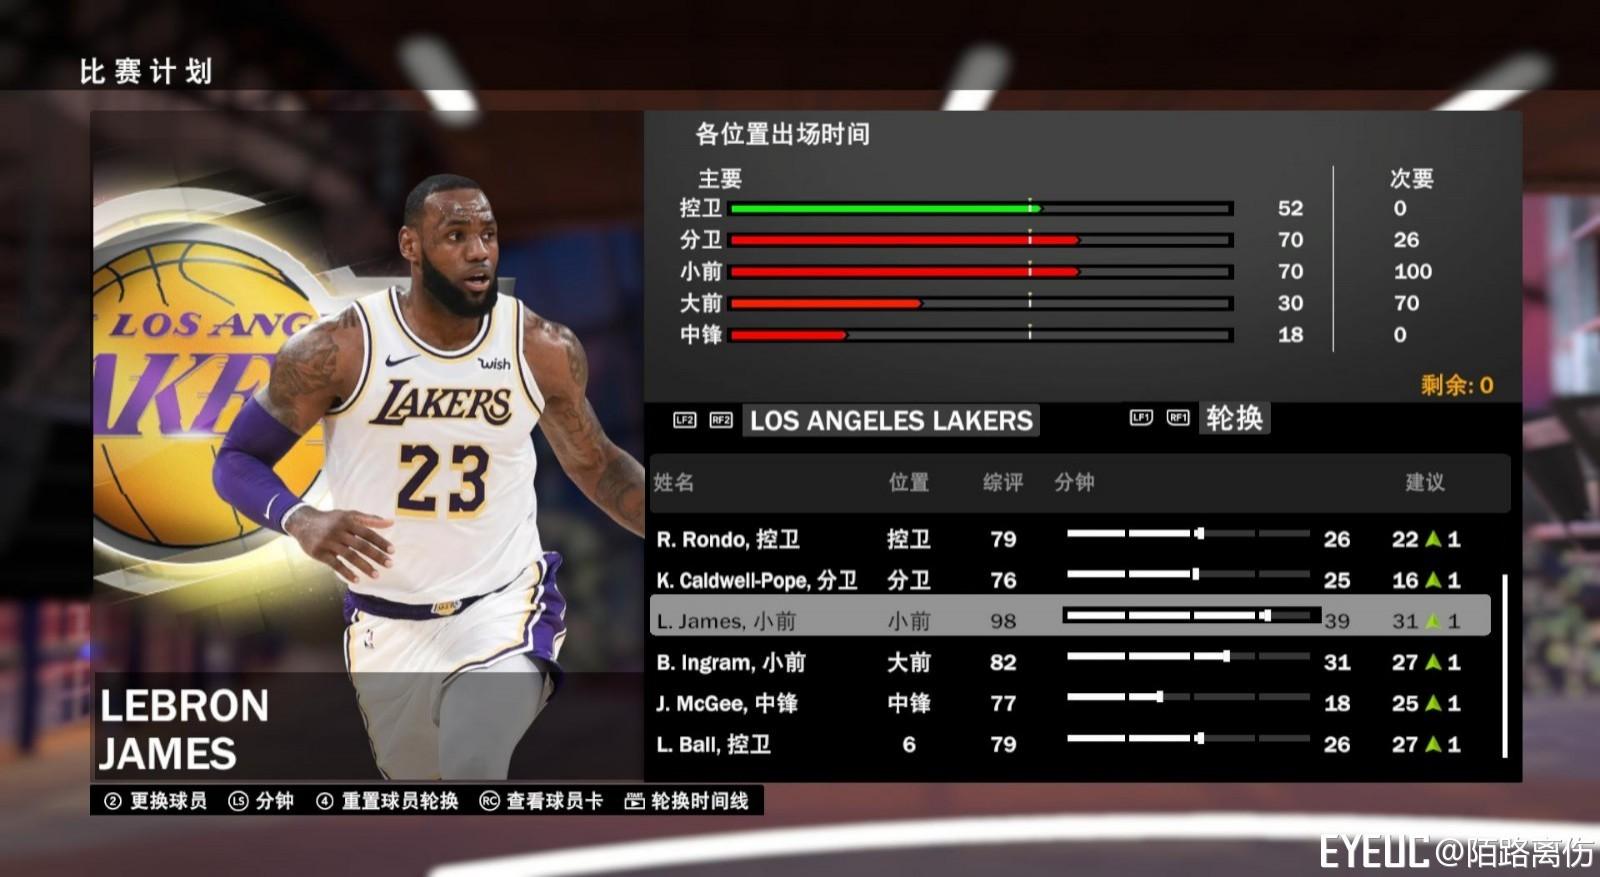 4815443ce74b NBA 2K19 - LeBron James Portrait Update v2 - Shuajota